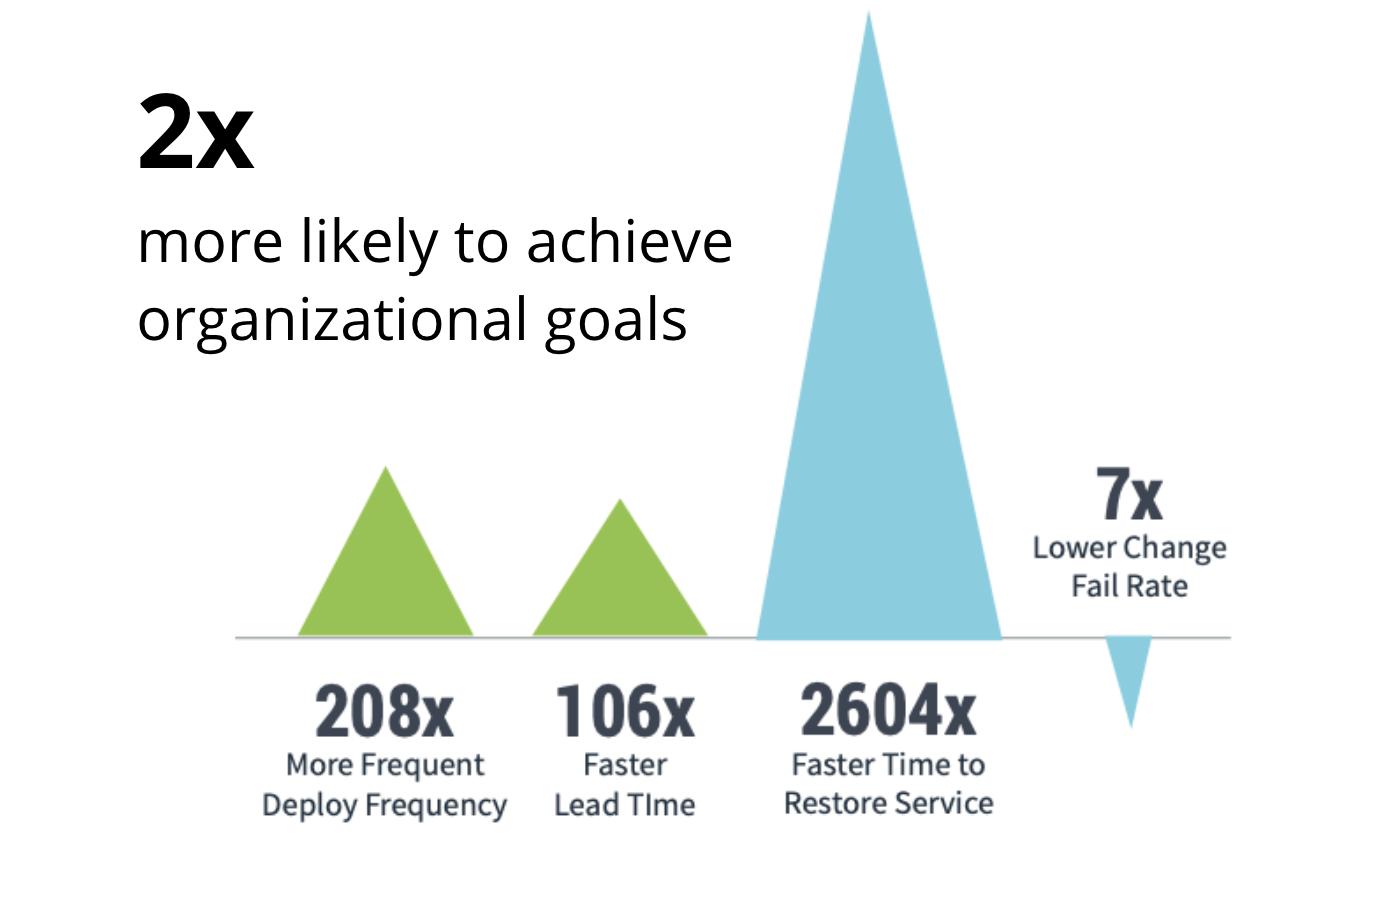 engineering performance drives organizational success